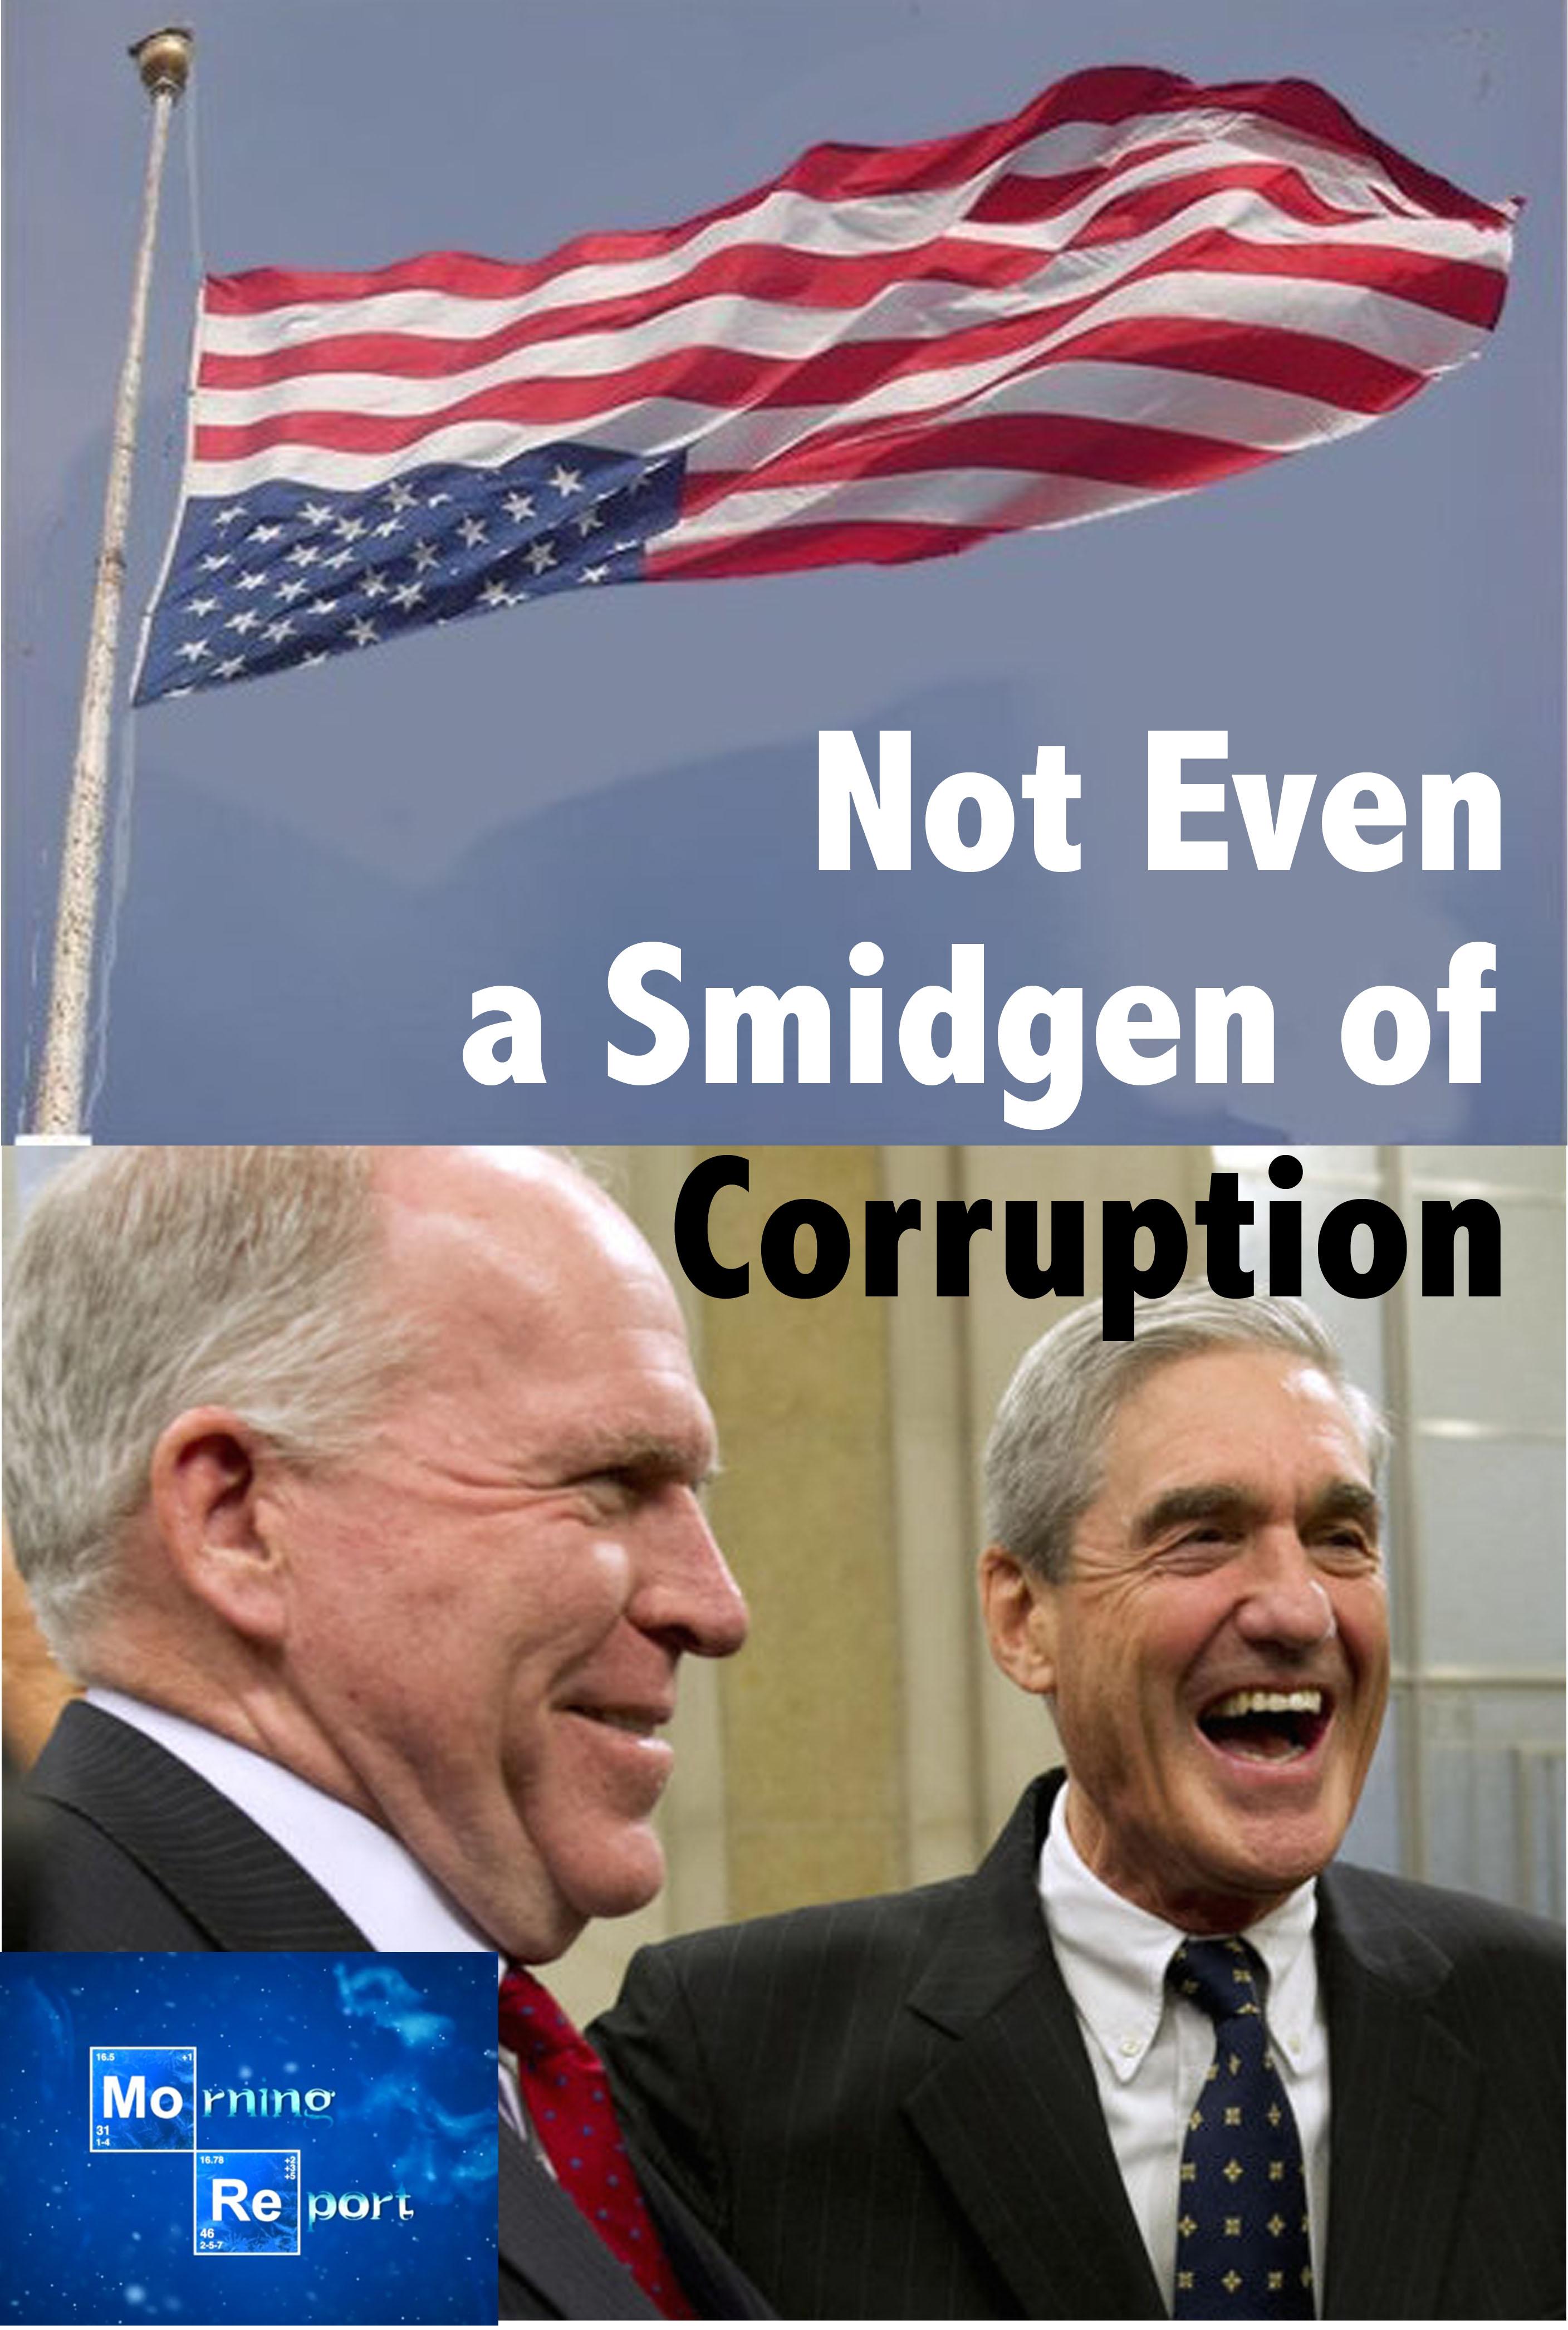 corruption.jpg